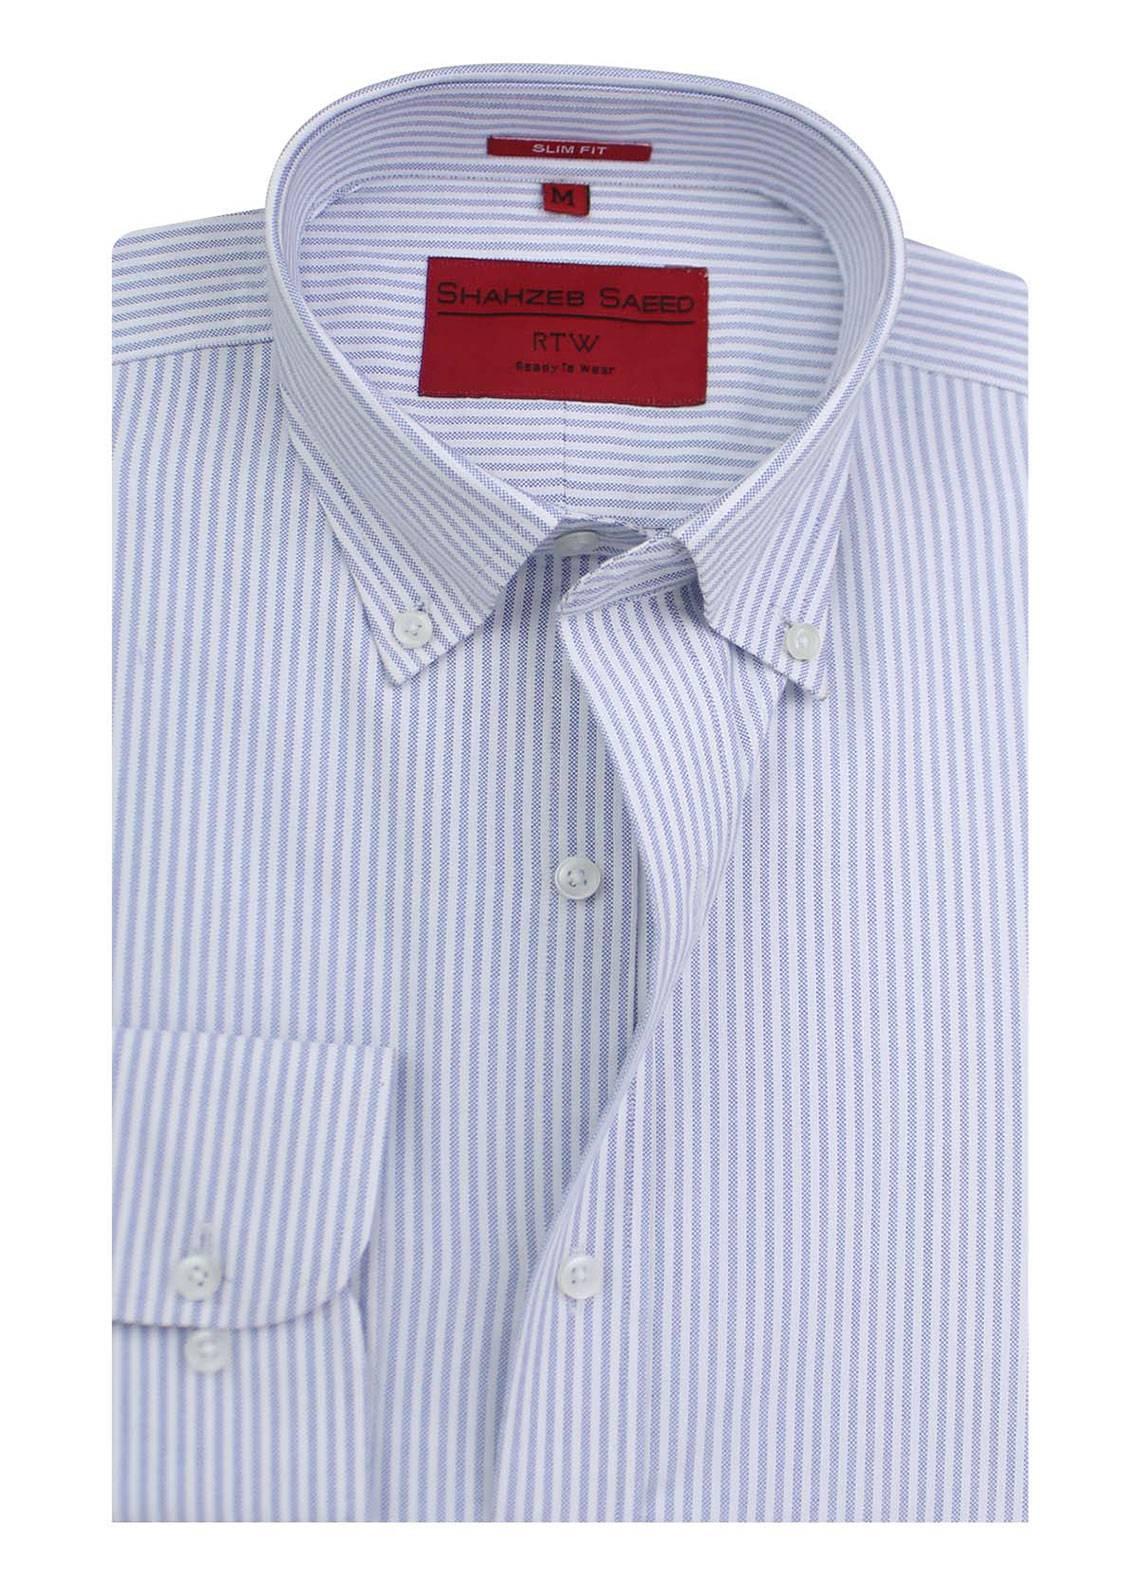 Shahzeb Saeed Cotton Formal Shirts for Men - Blue RTW-1345